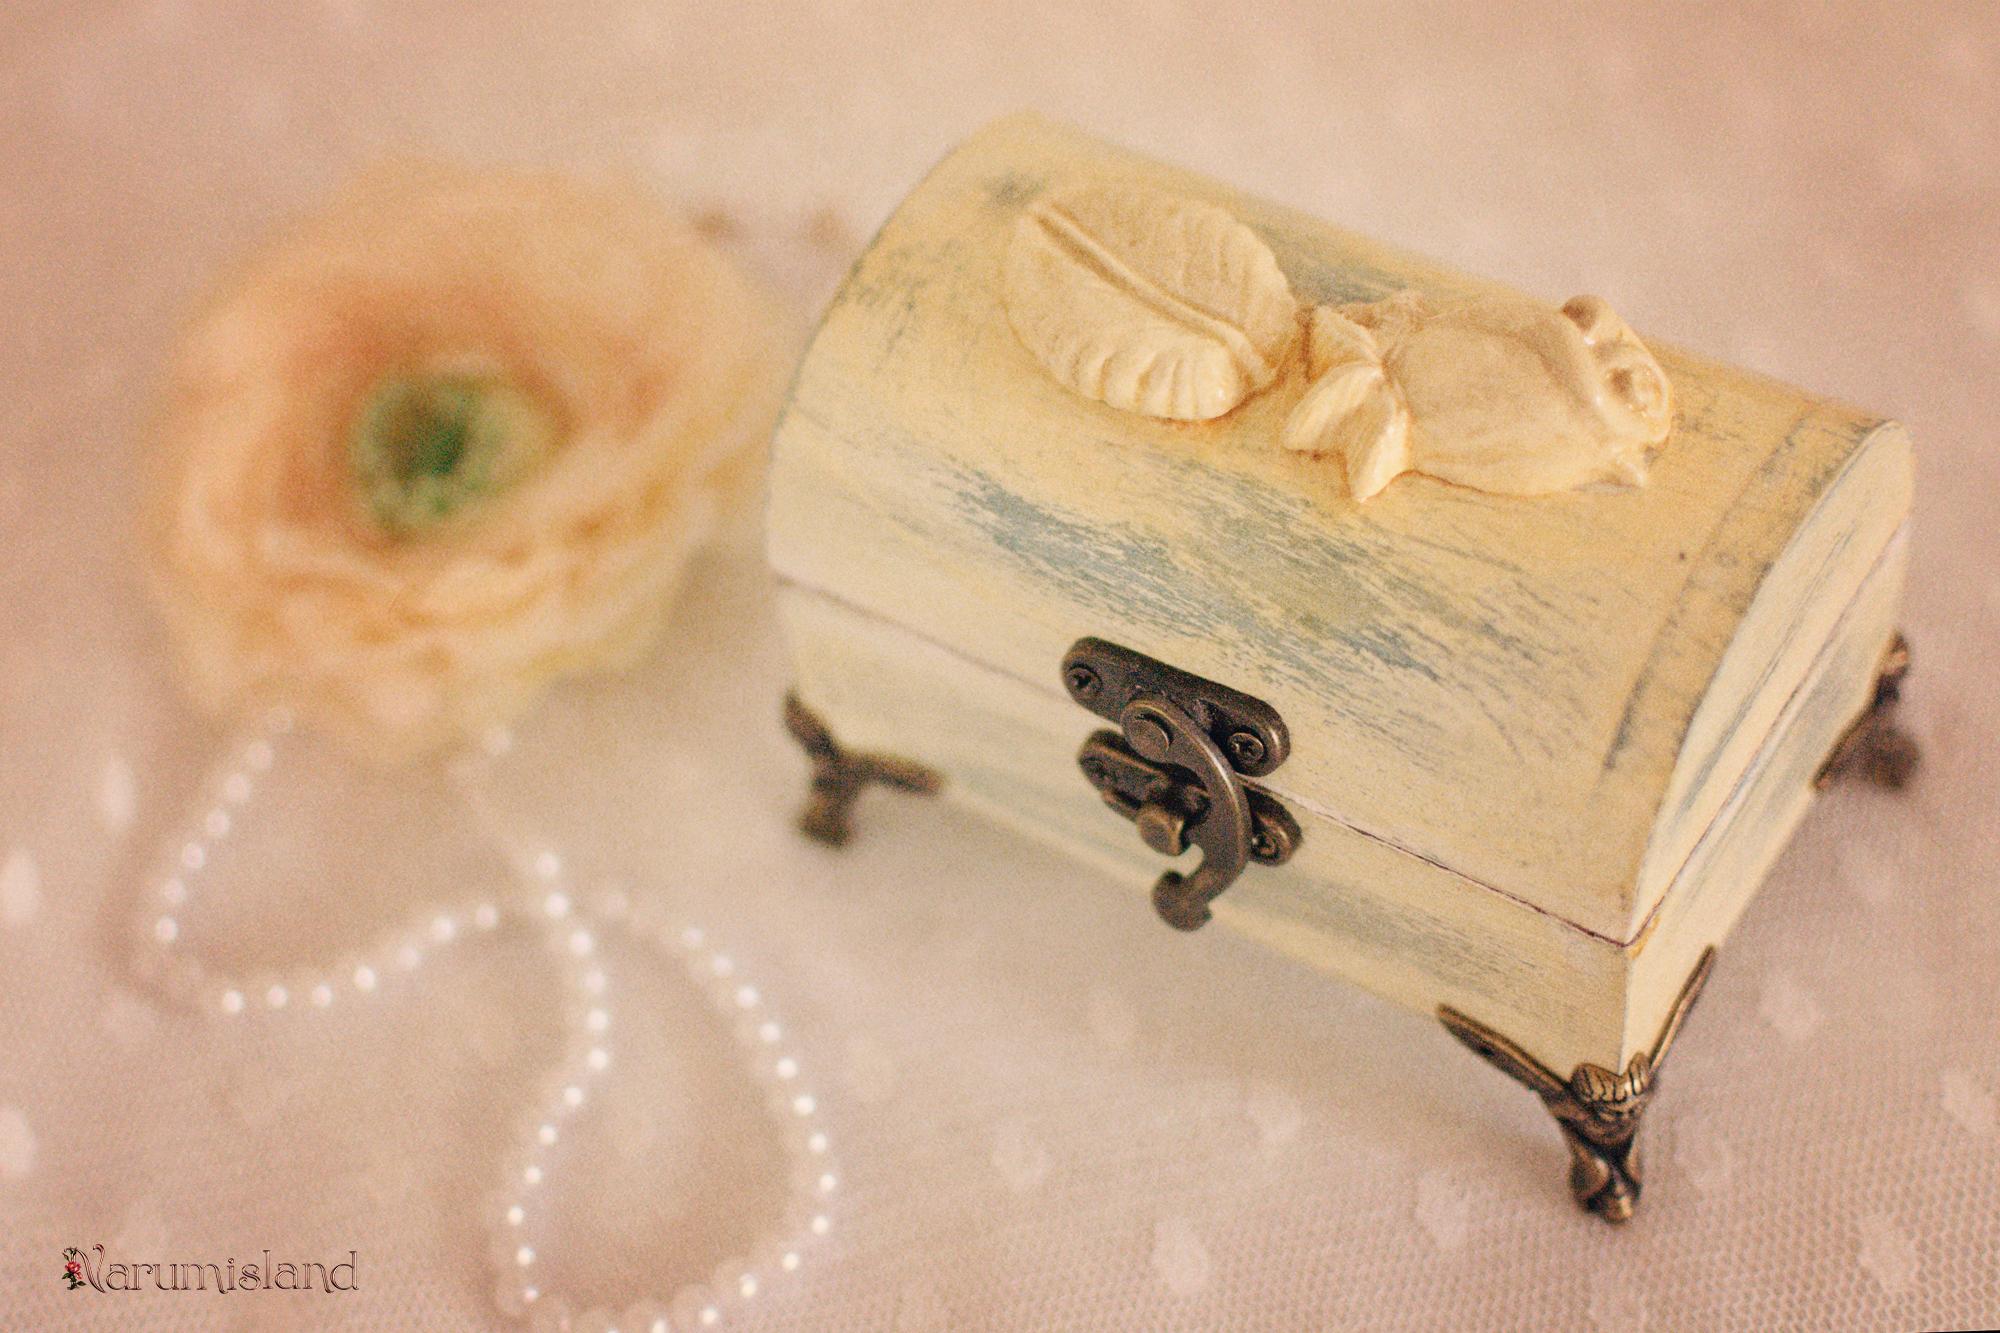 Cufaras Cu Ornamente 3d Trandafiri Si Picioruse Matalice In Forma Ingerasi